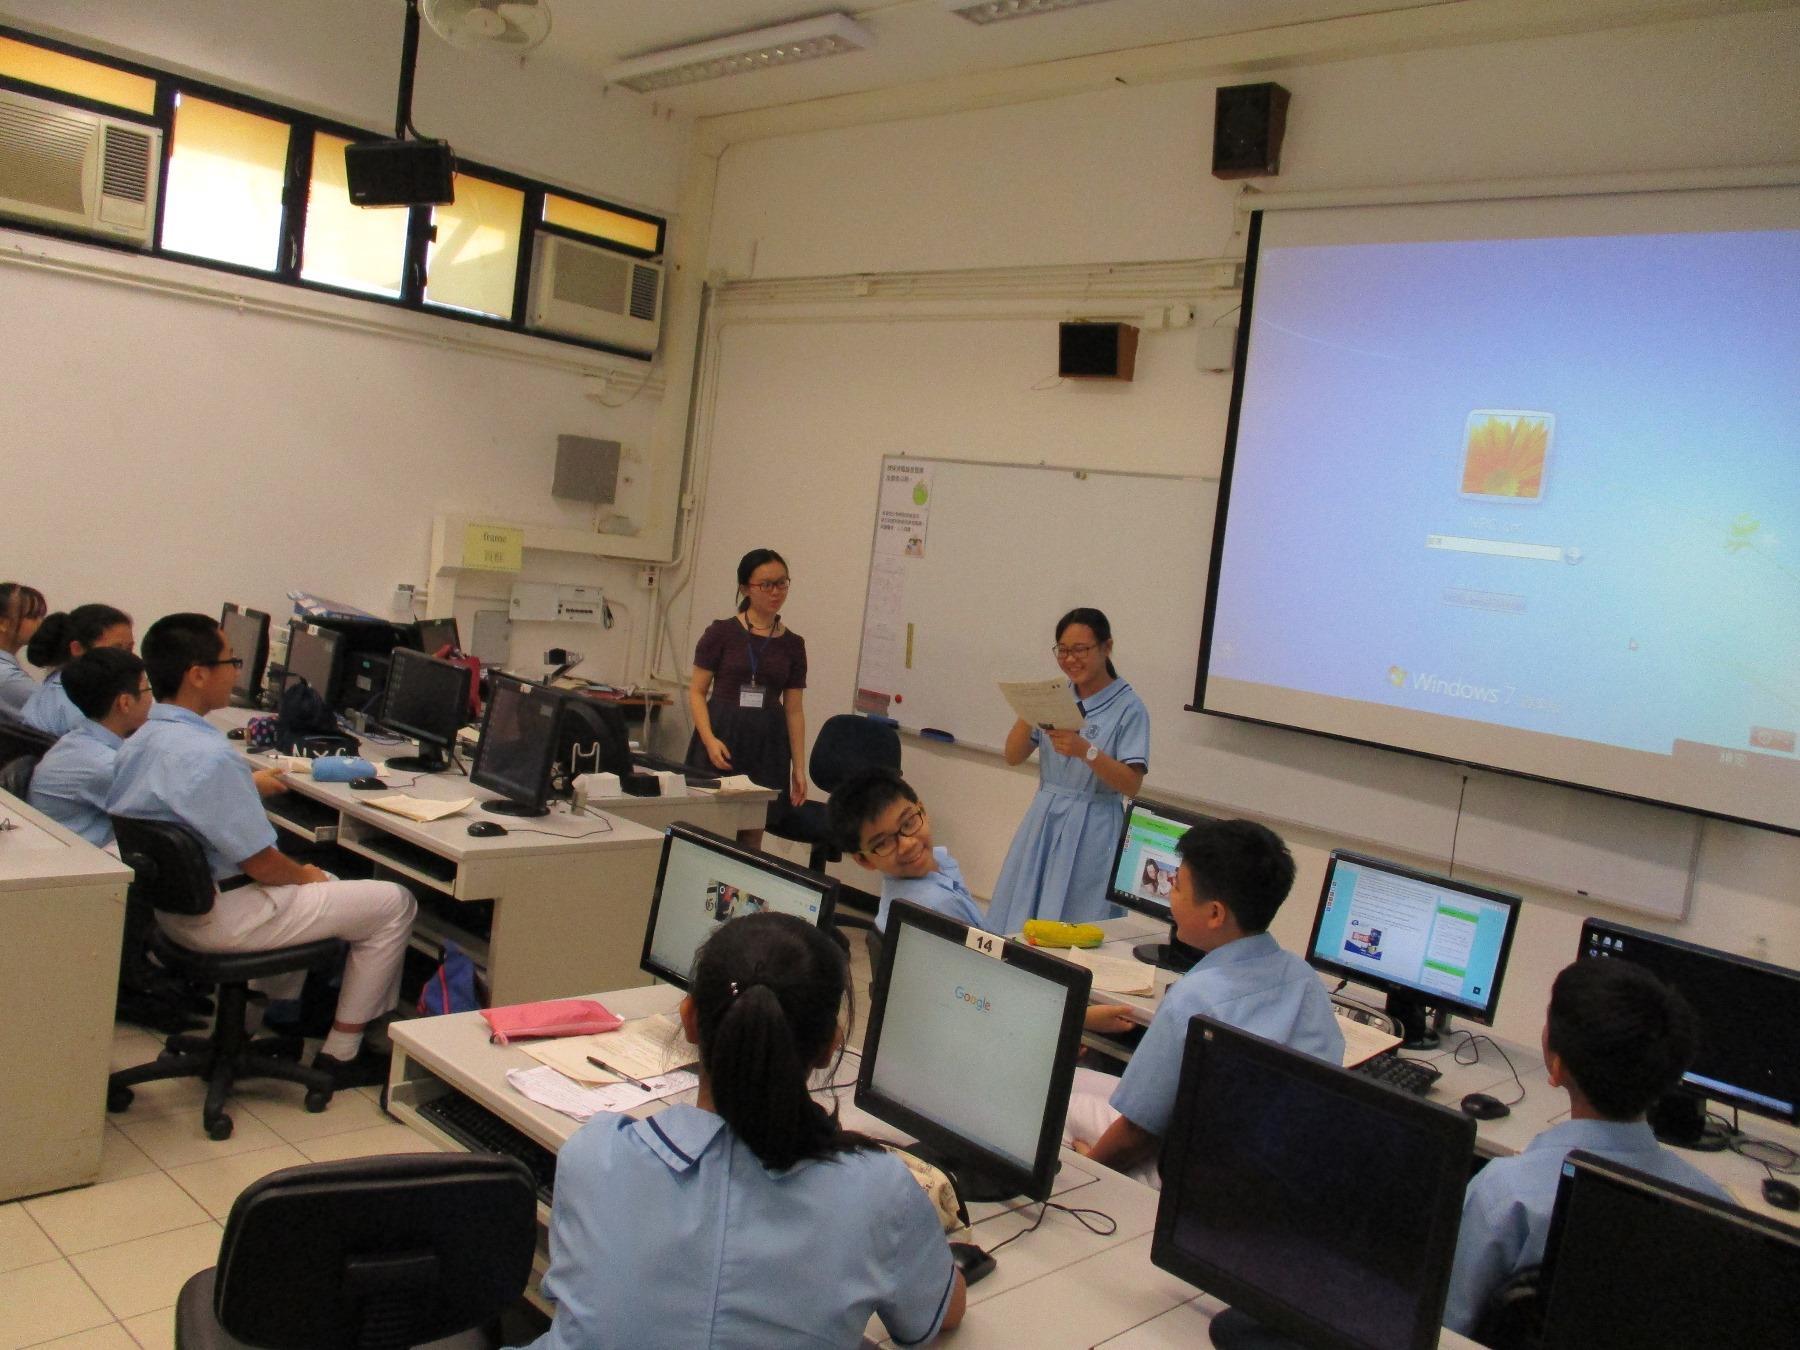 http://www.npc.edu.hk/sites/default/files/img_0153.jpg